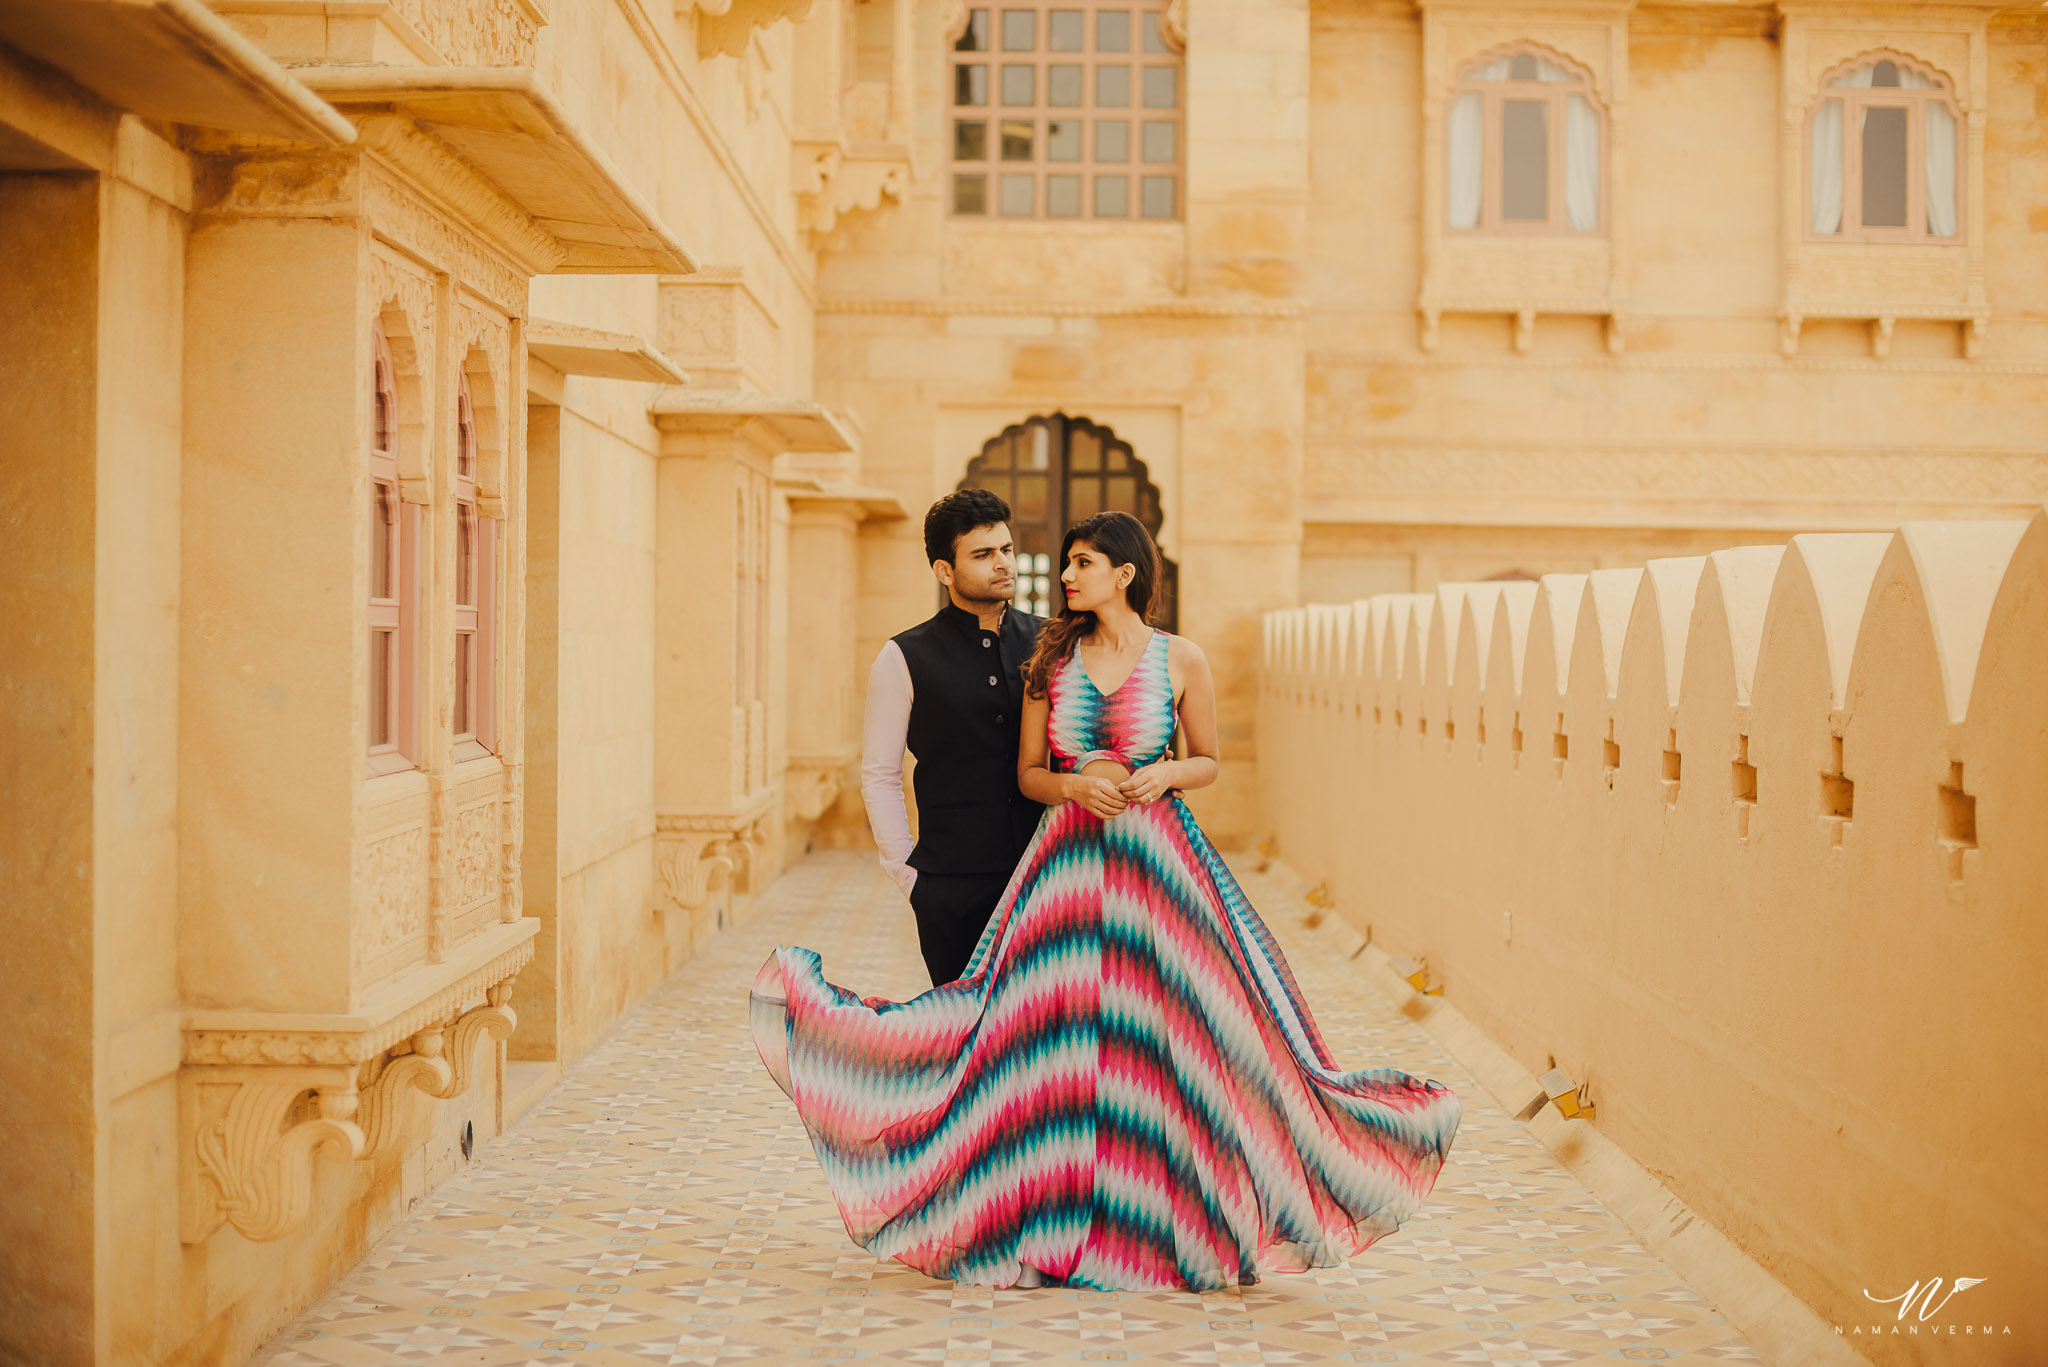 NVP_RoliXArihant_portraitsession_jaisalmer-89.jpg